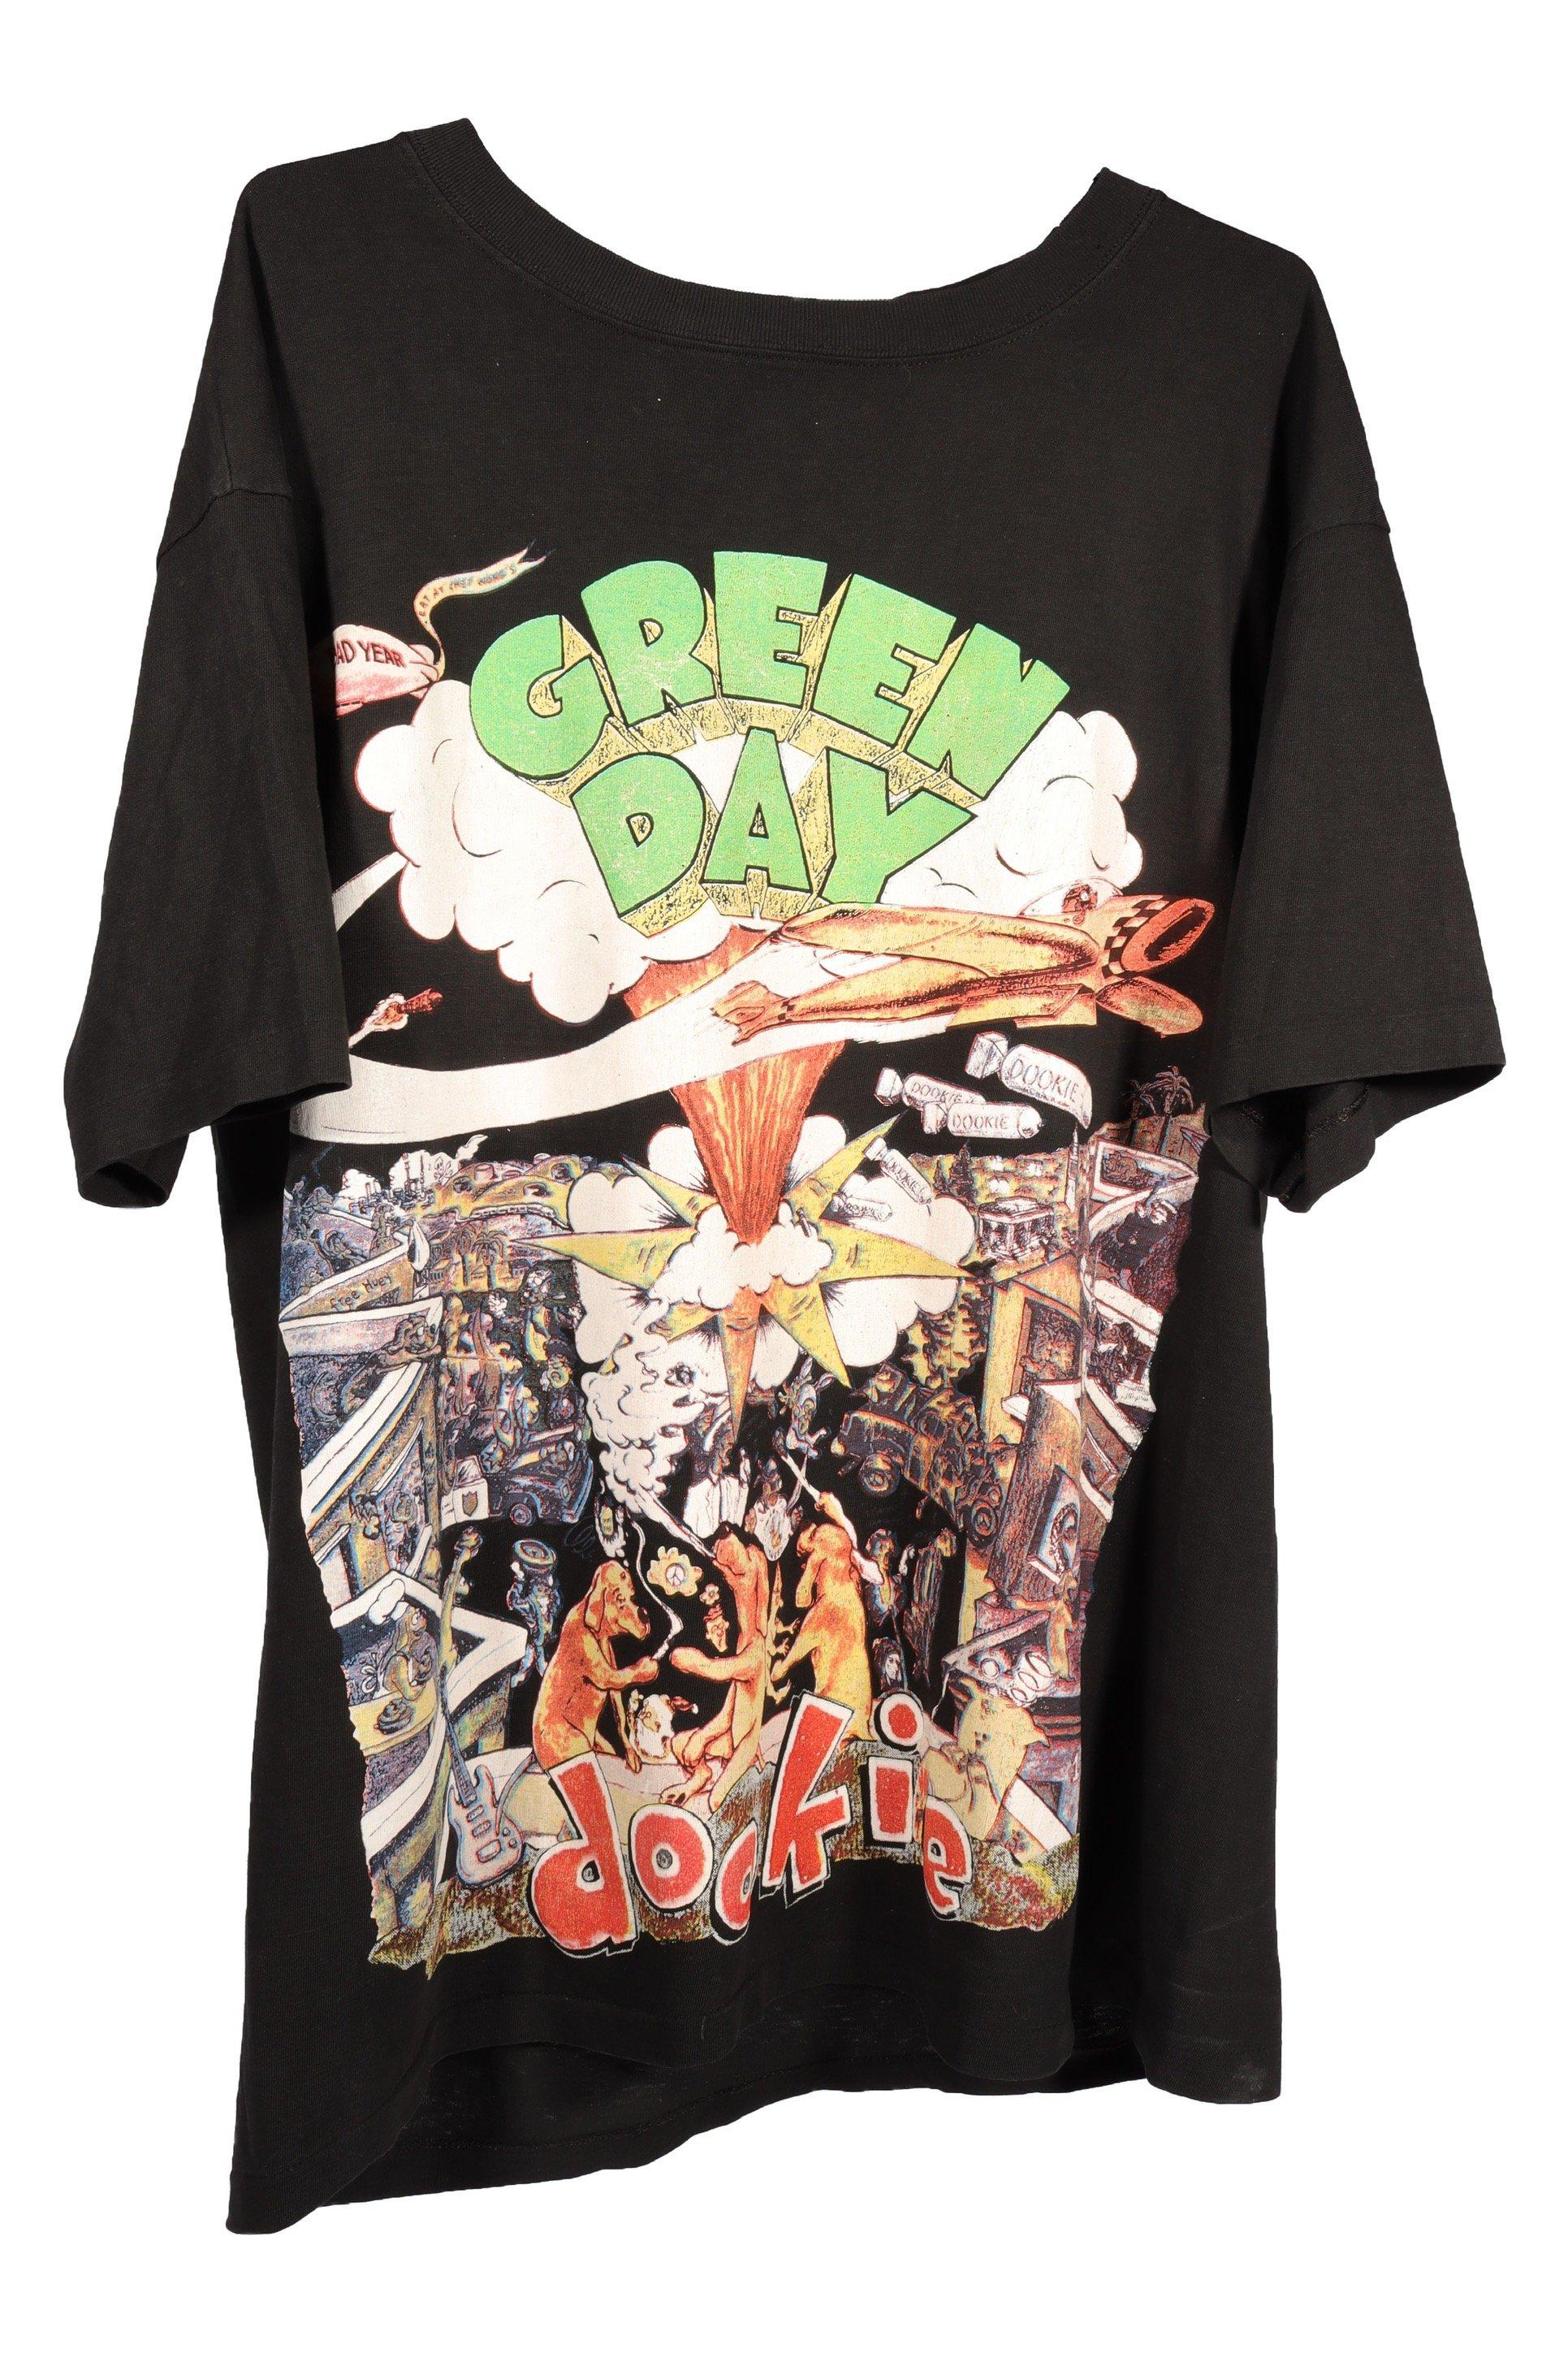 Vintage 90s Greenday Bootleg Dookies Album with portrait and Full lyric Album on rear print Shirt RARE!